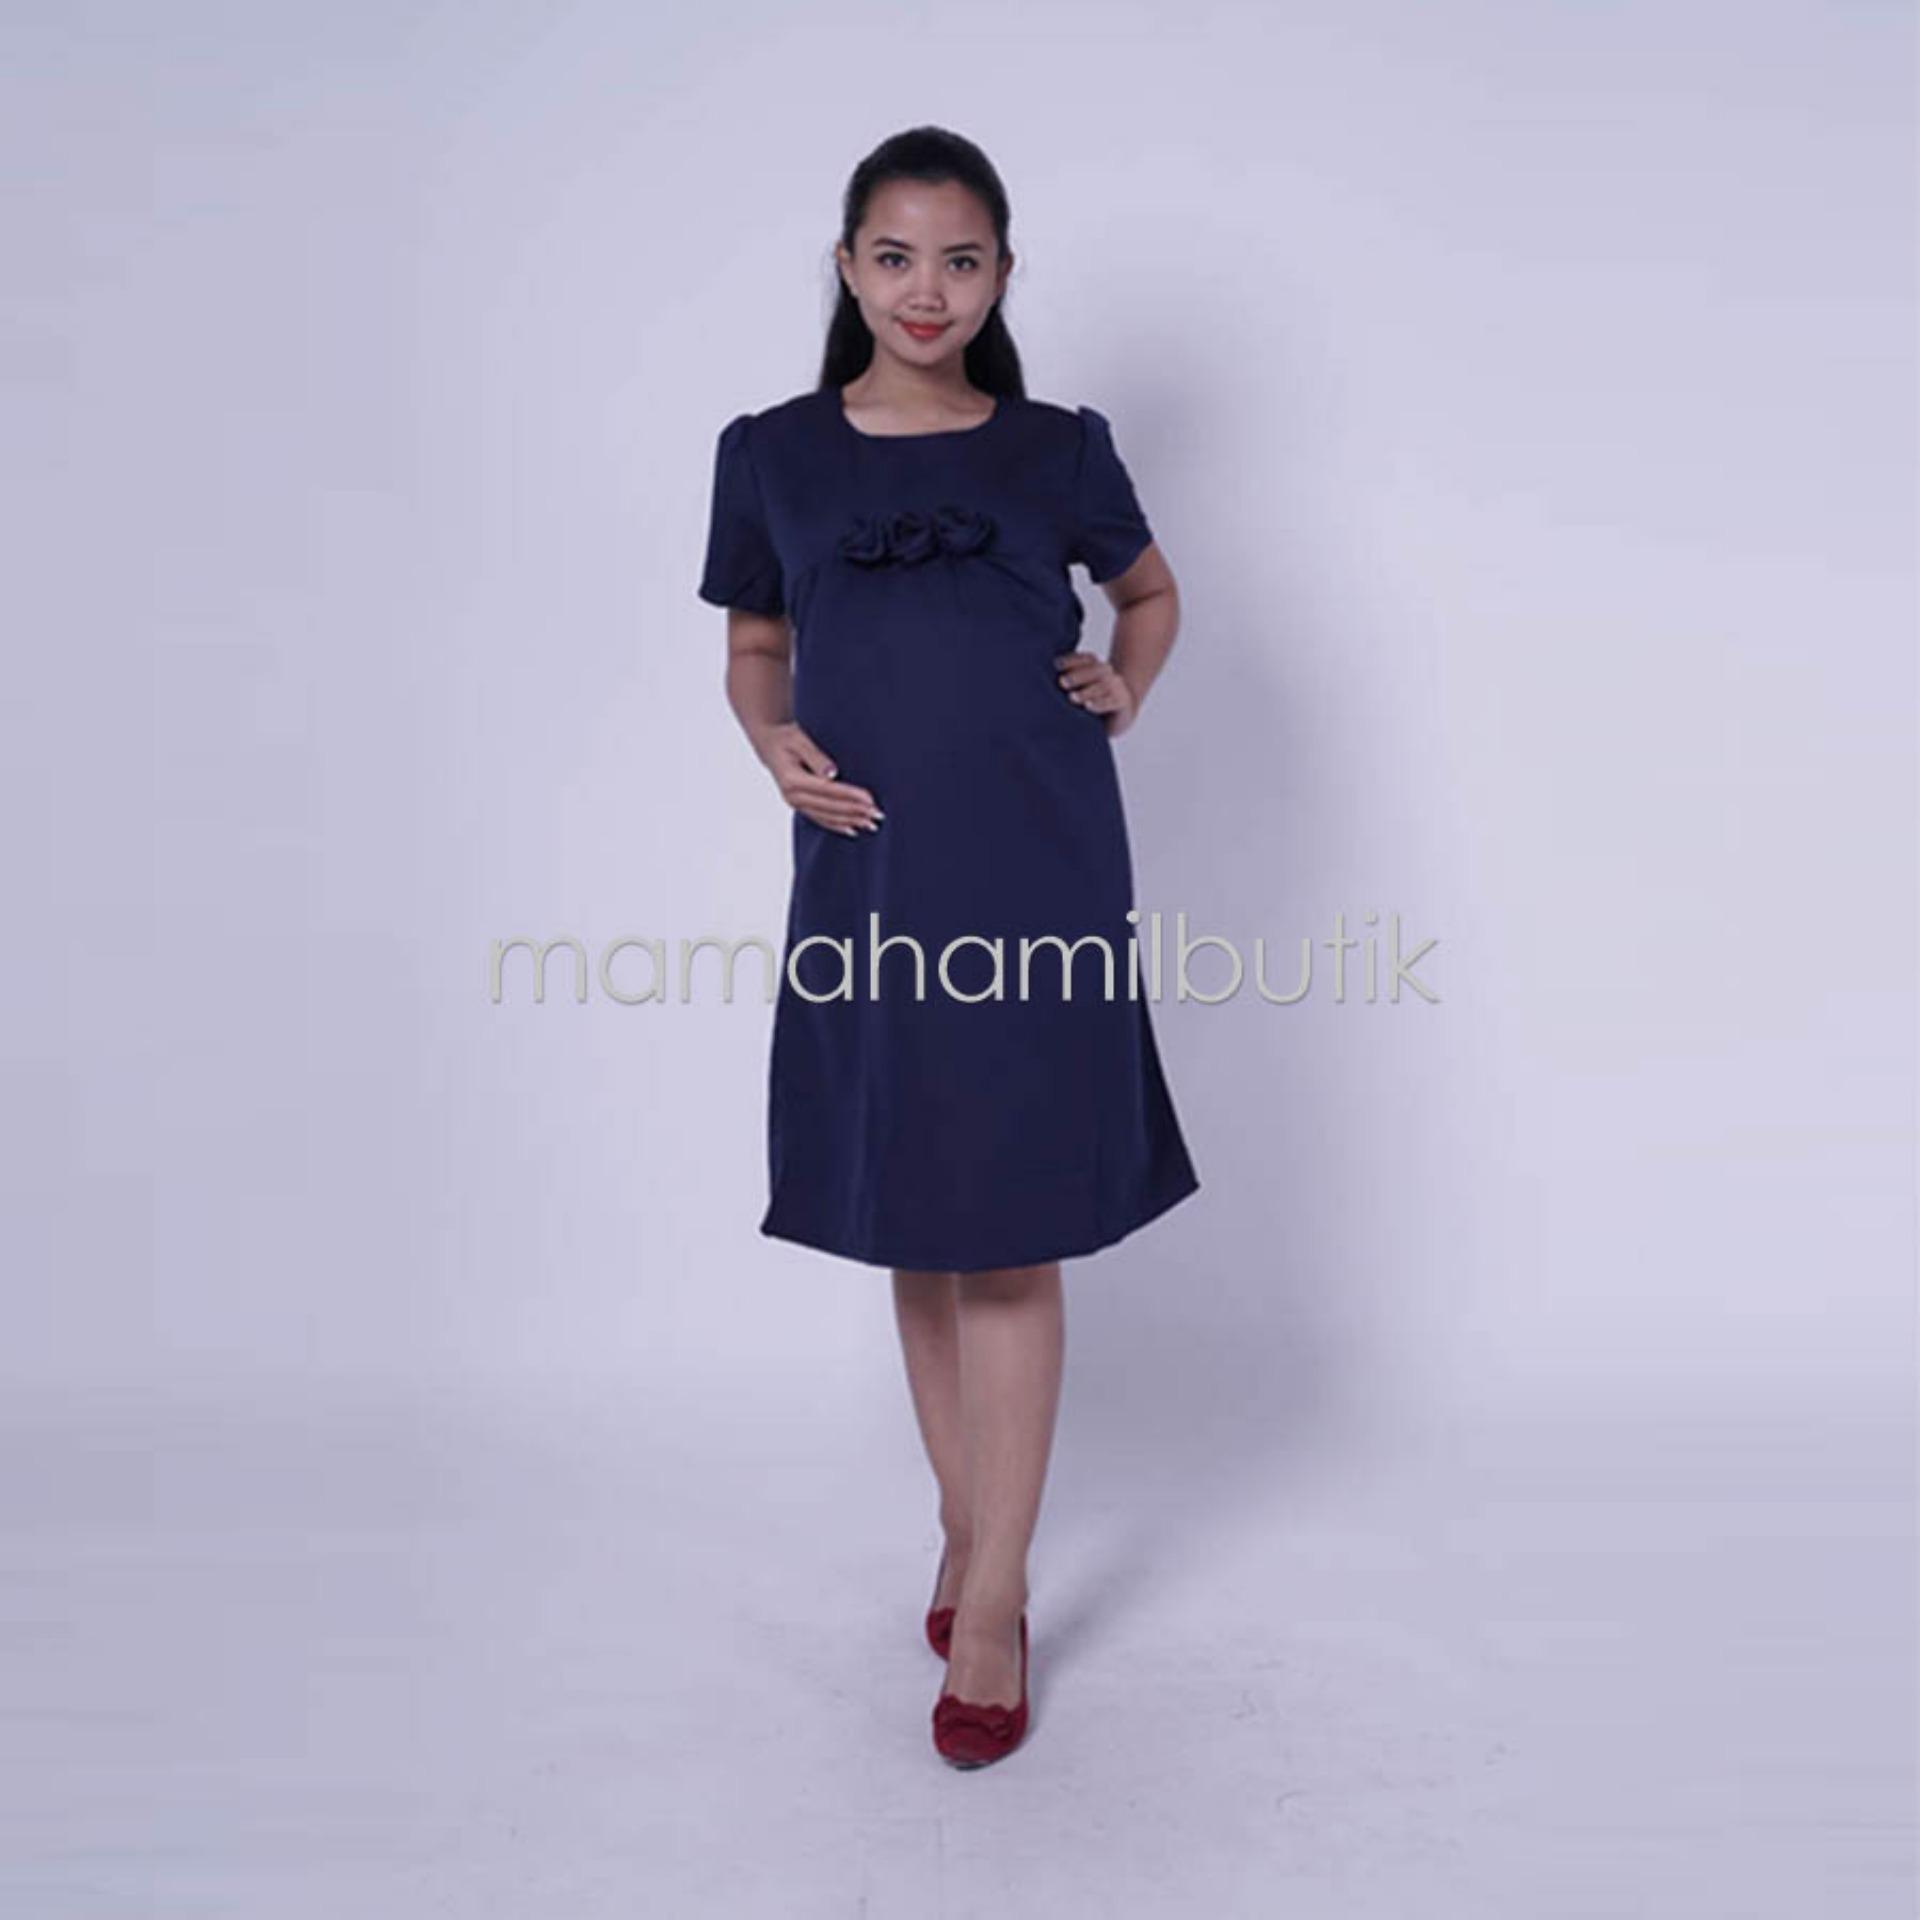 Beli Mama Hamil Free Cd Hamil 1Psc Baju Hamil Dress Hamil Feny Dress Pesta Modis Simpel Rose Jawa Timur